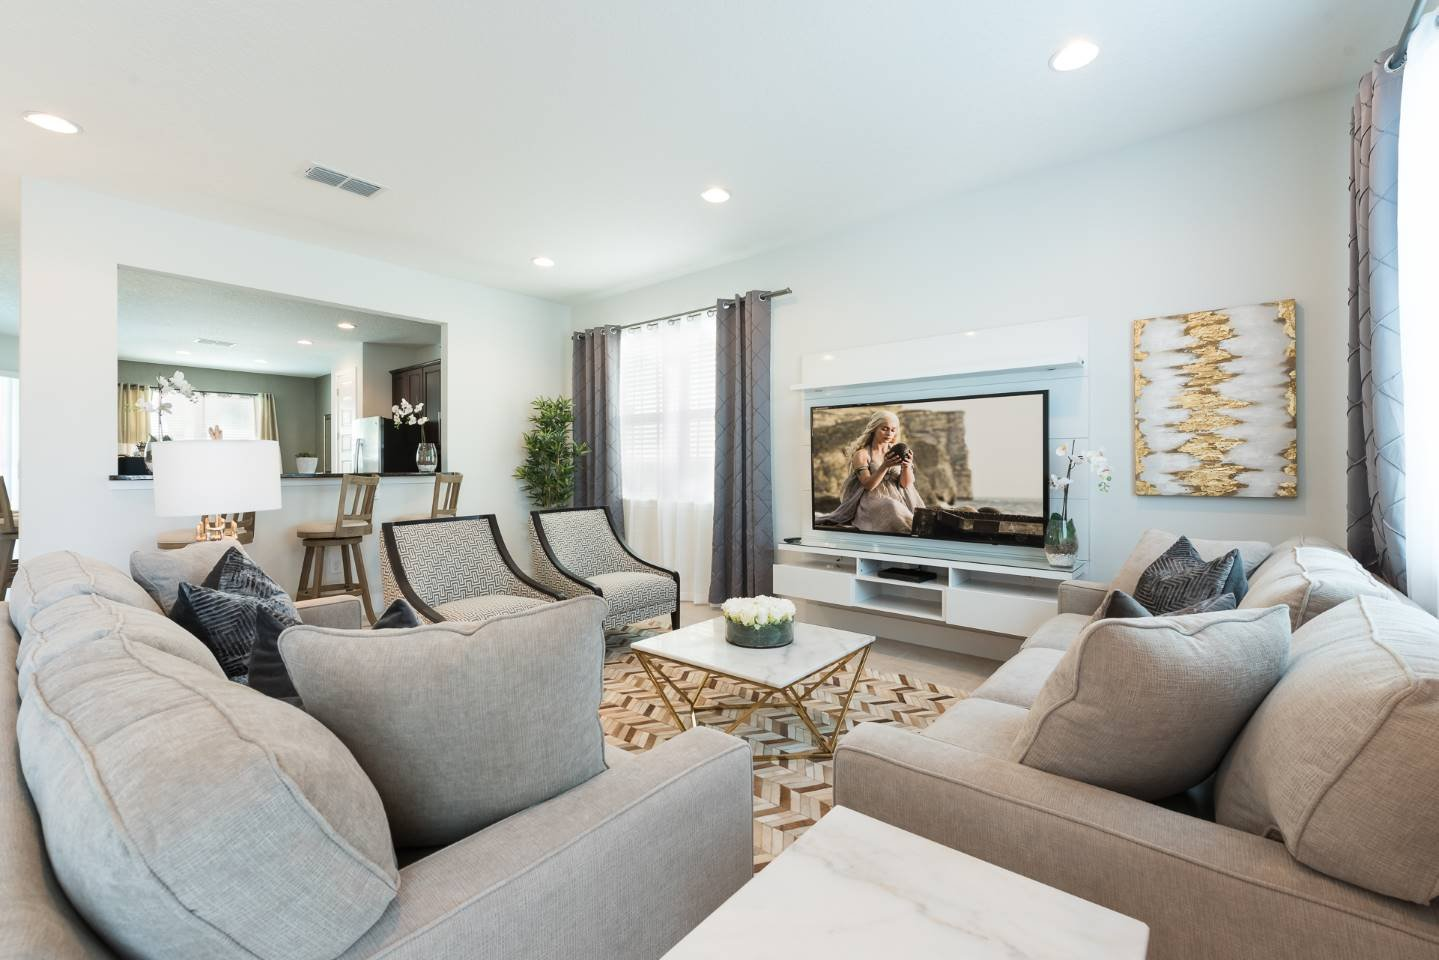 [amenities:living-area:3] Living Area